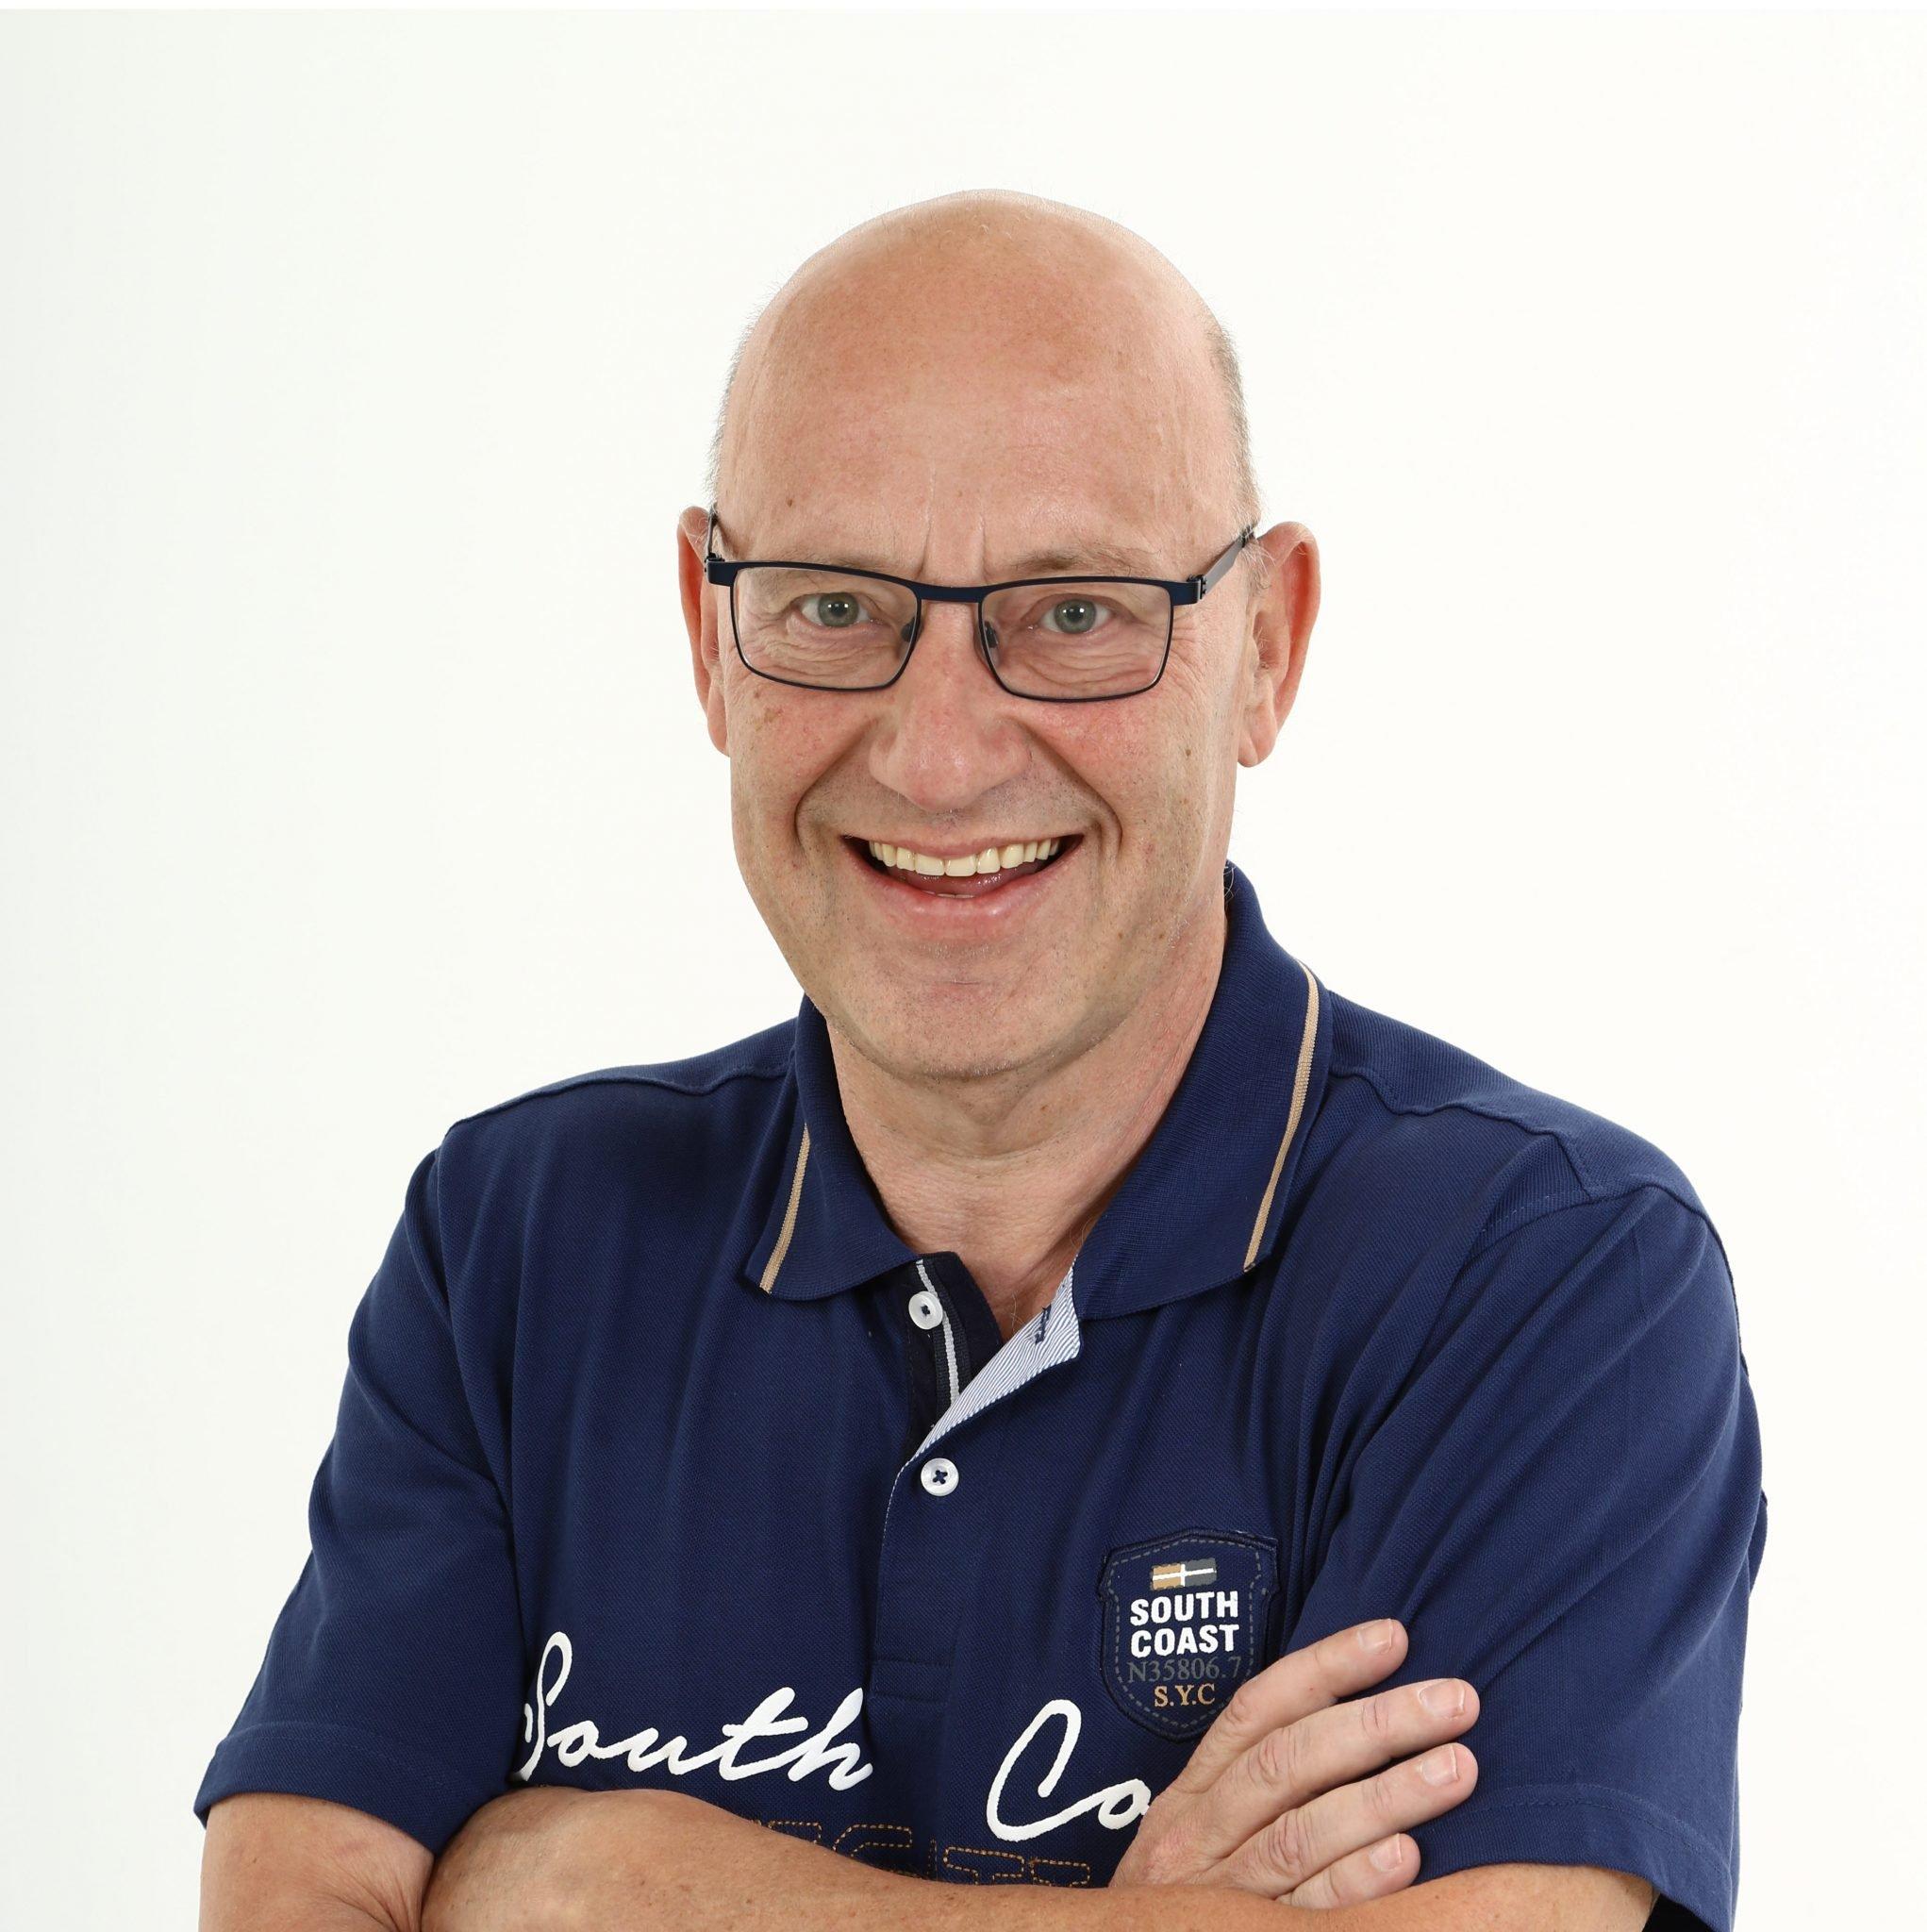 Wim Tilburgs